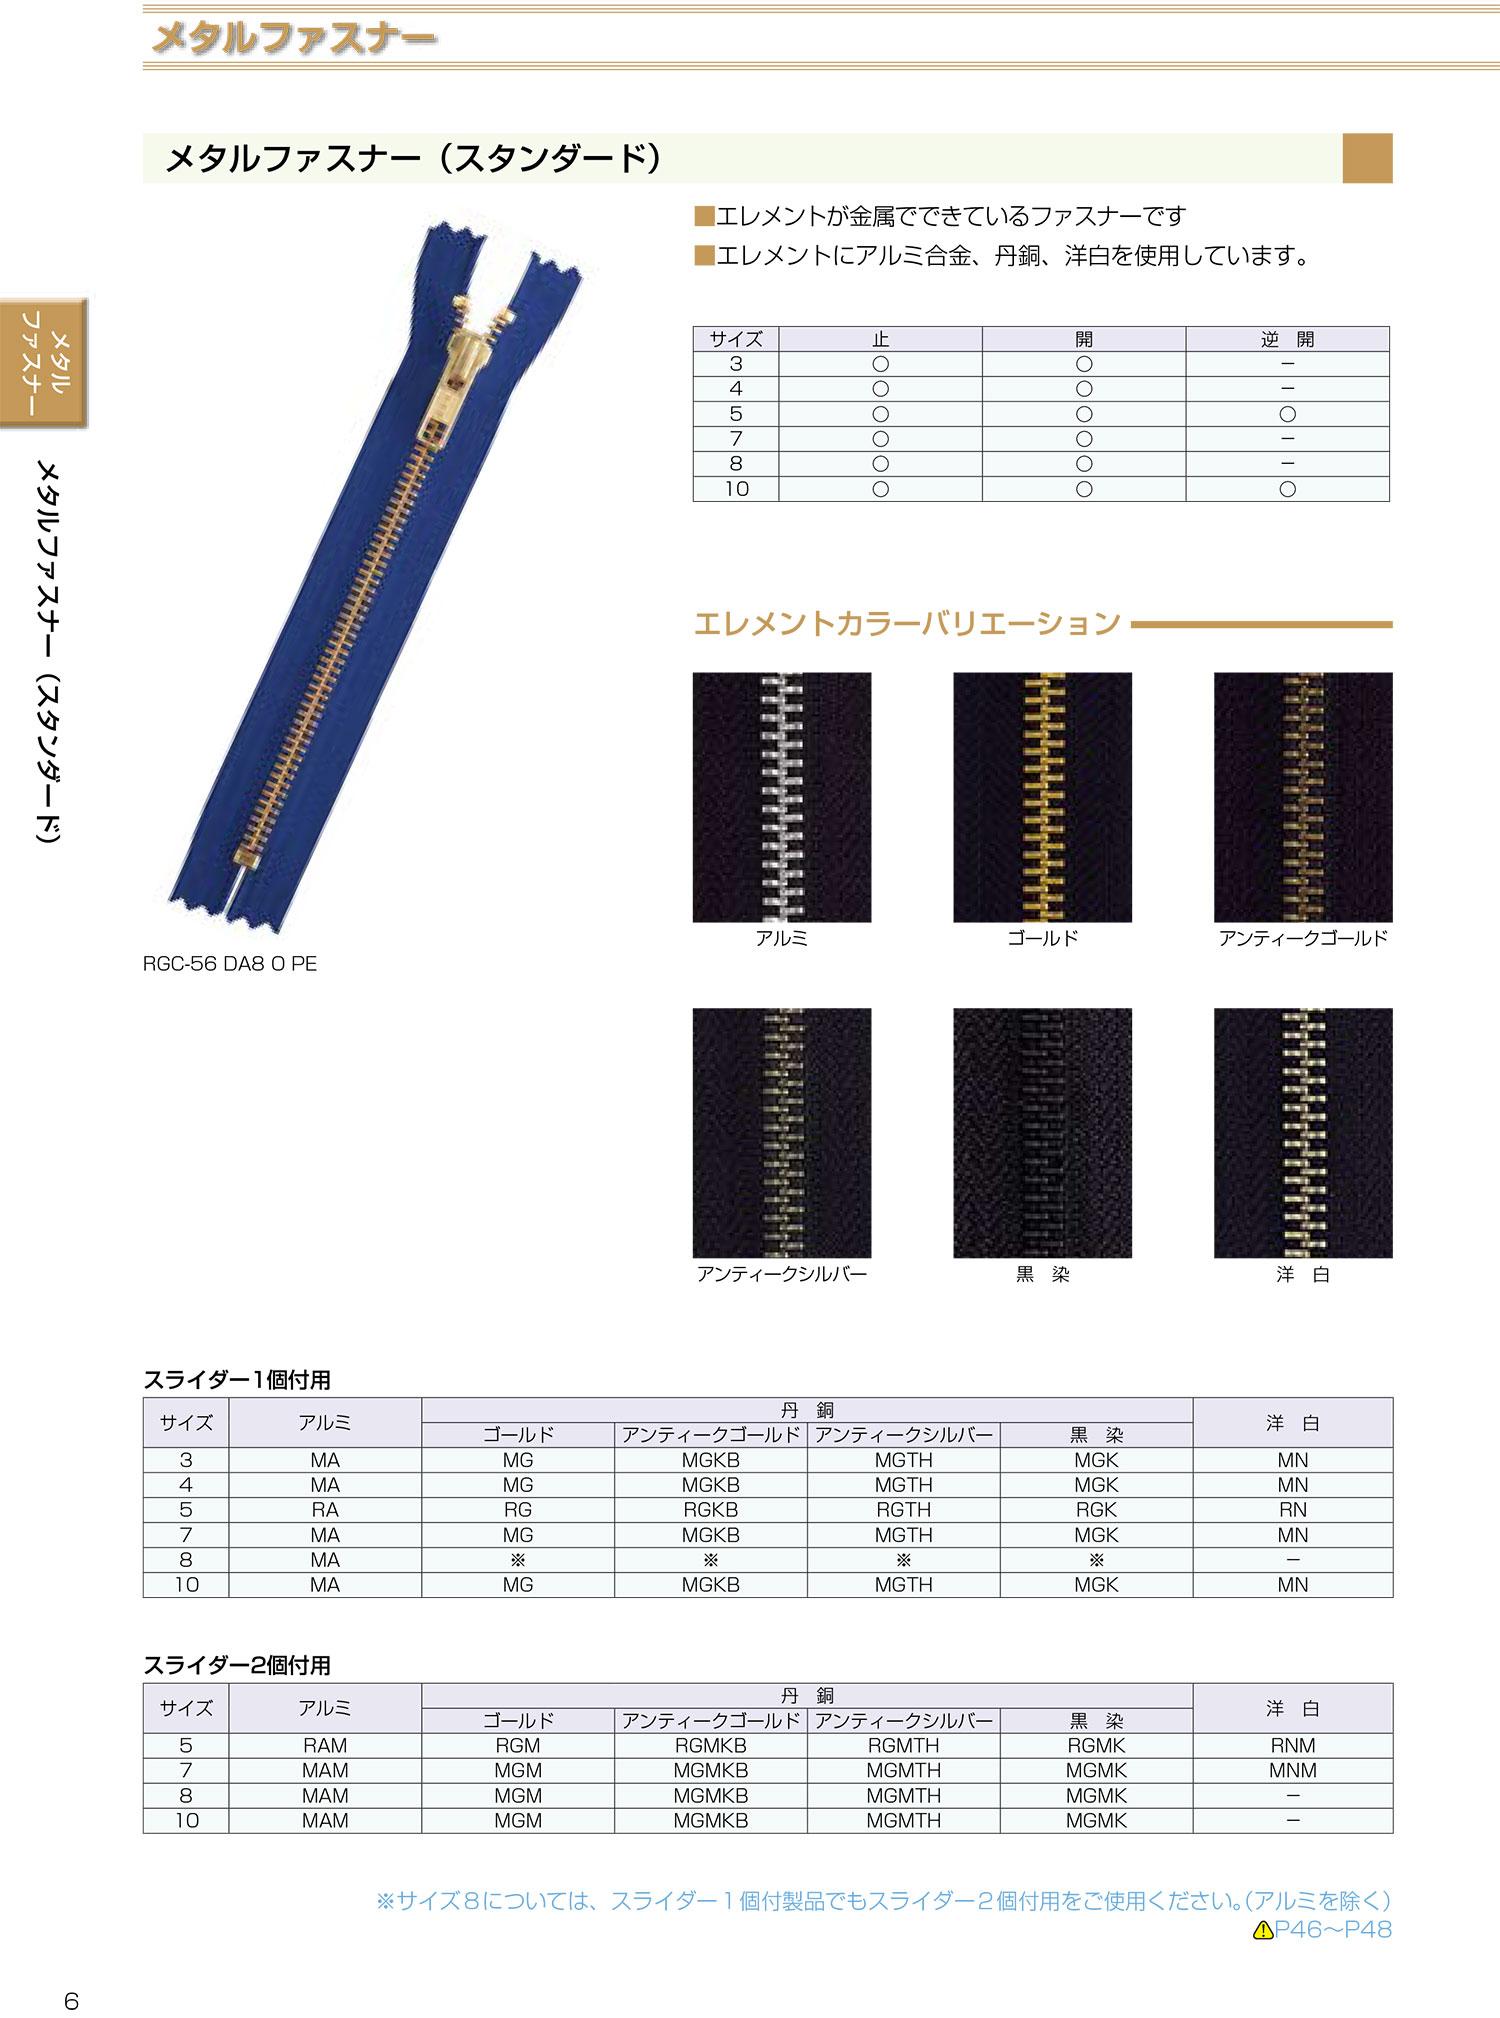 5RGKC YKKメタルファスナー 5サイズ 黒染 止め YKK/オークラ商事 - ApparelX アパレル資材卸通販